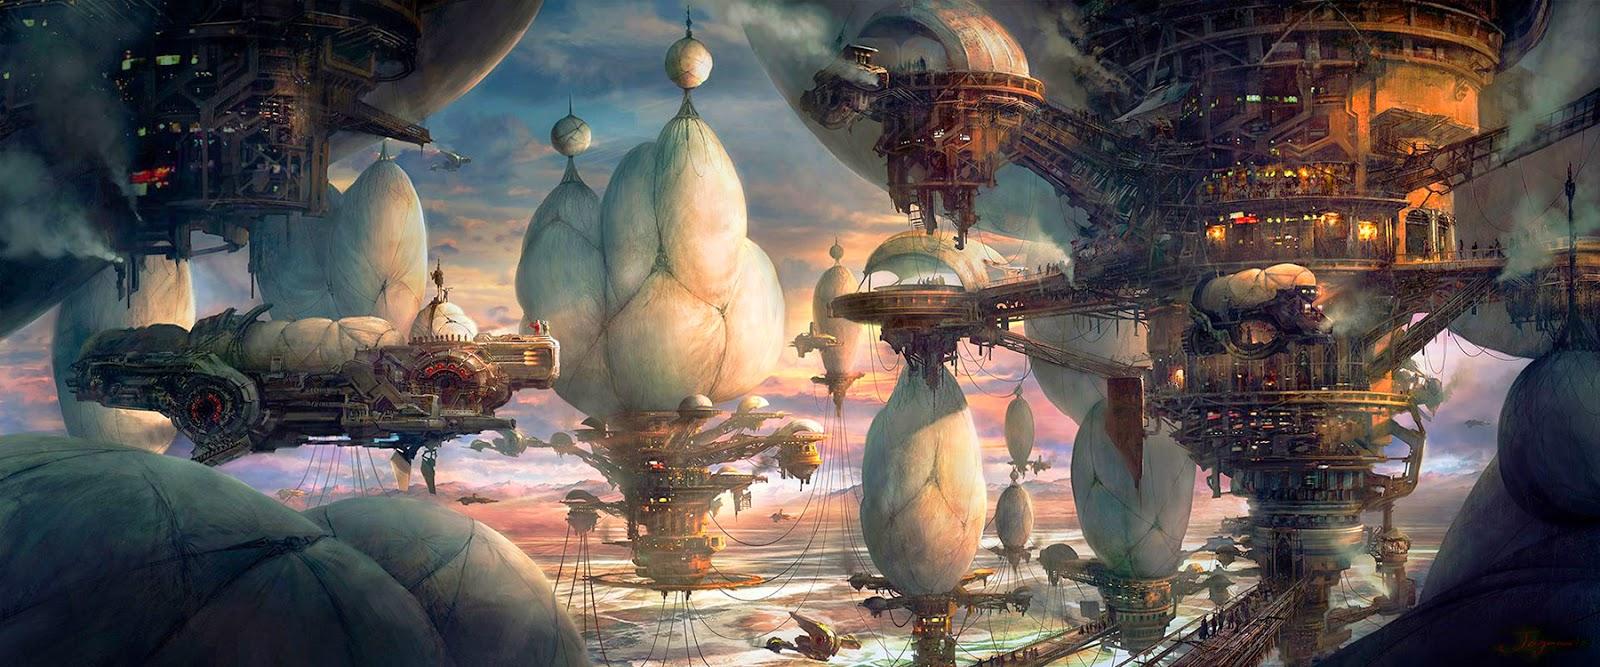 mortal-engines-flying-ships-artwork.jpg